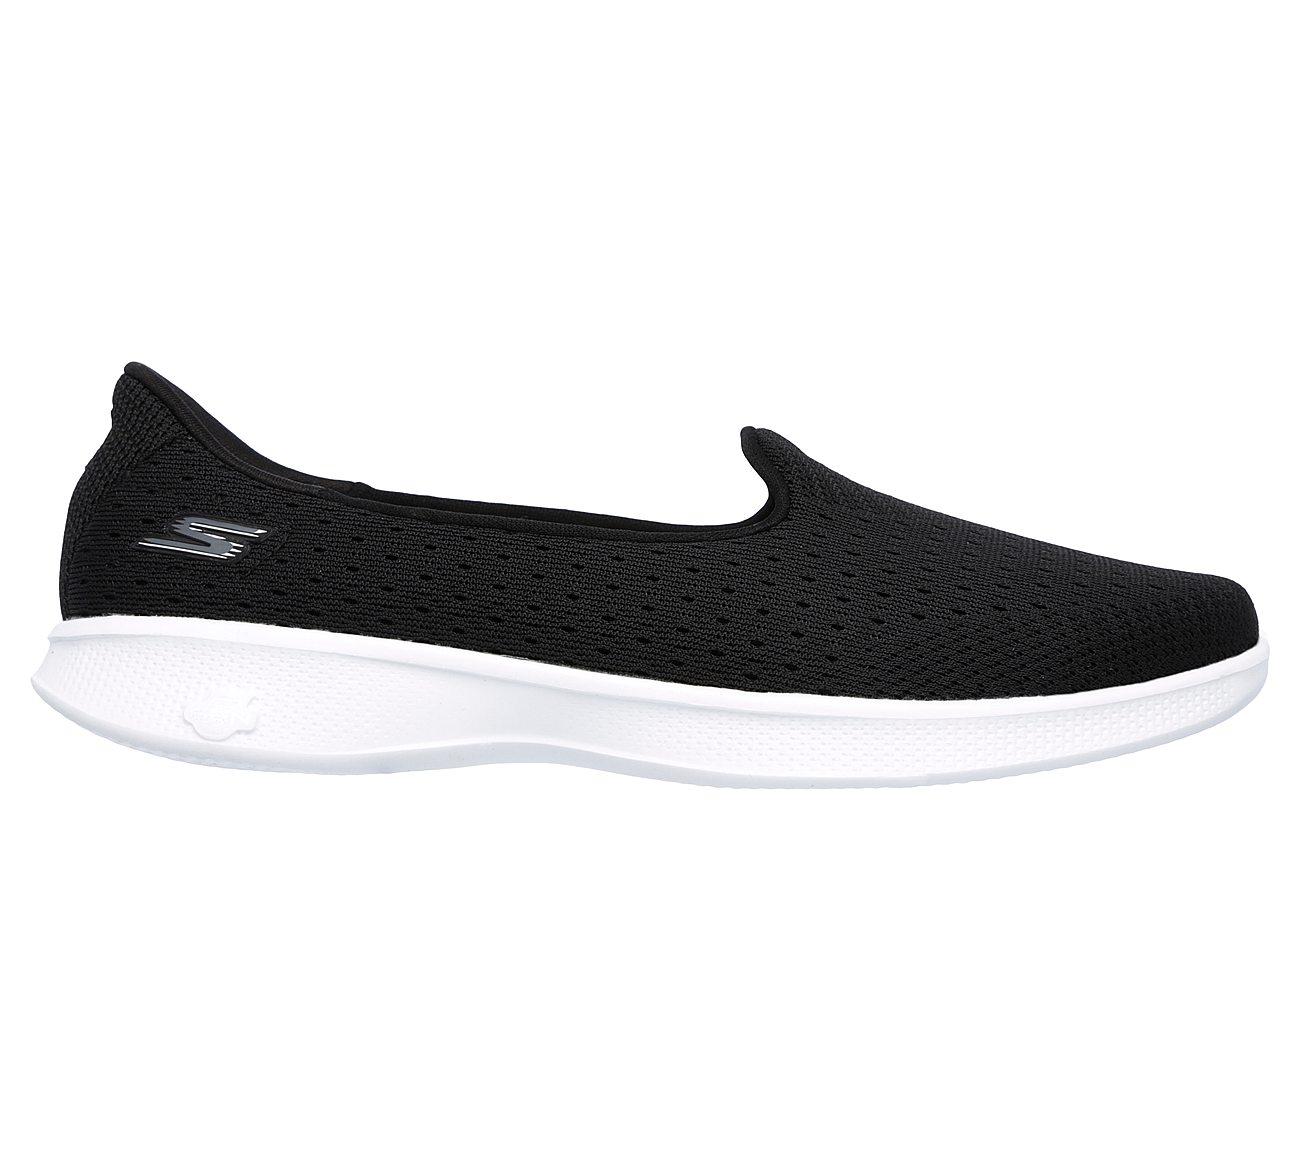 Buy SKECHERS Skechers GO STEP Lite